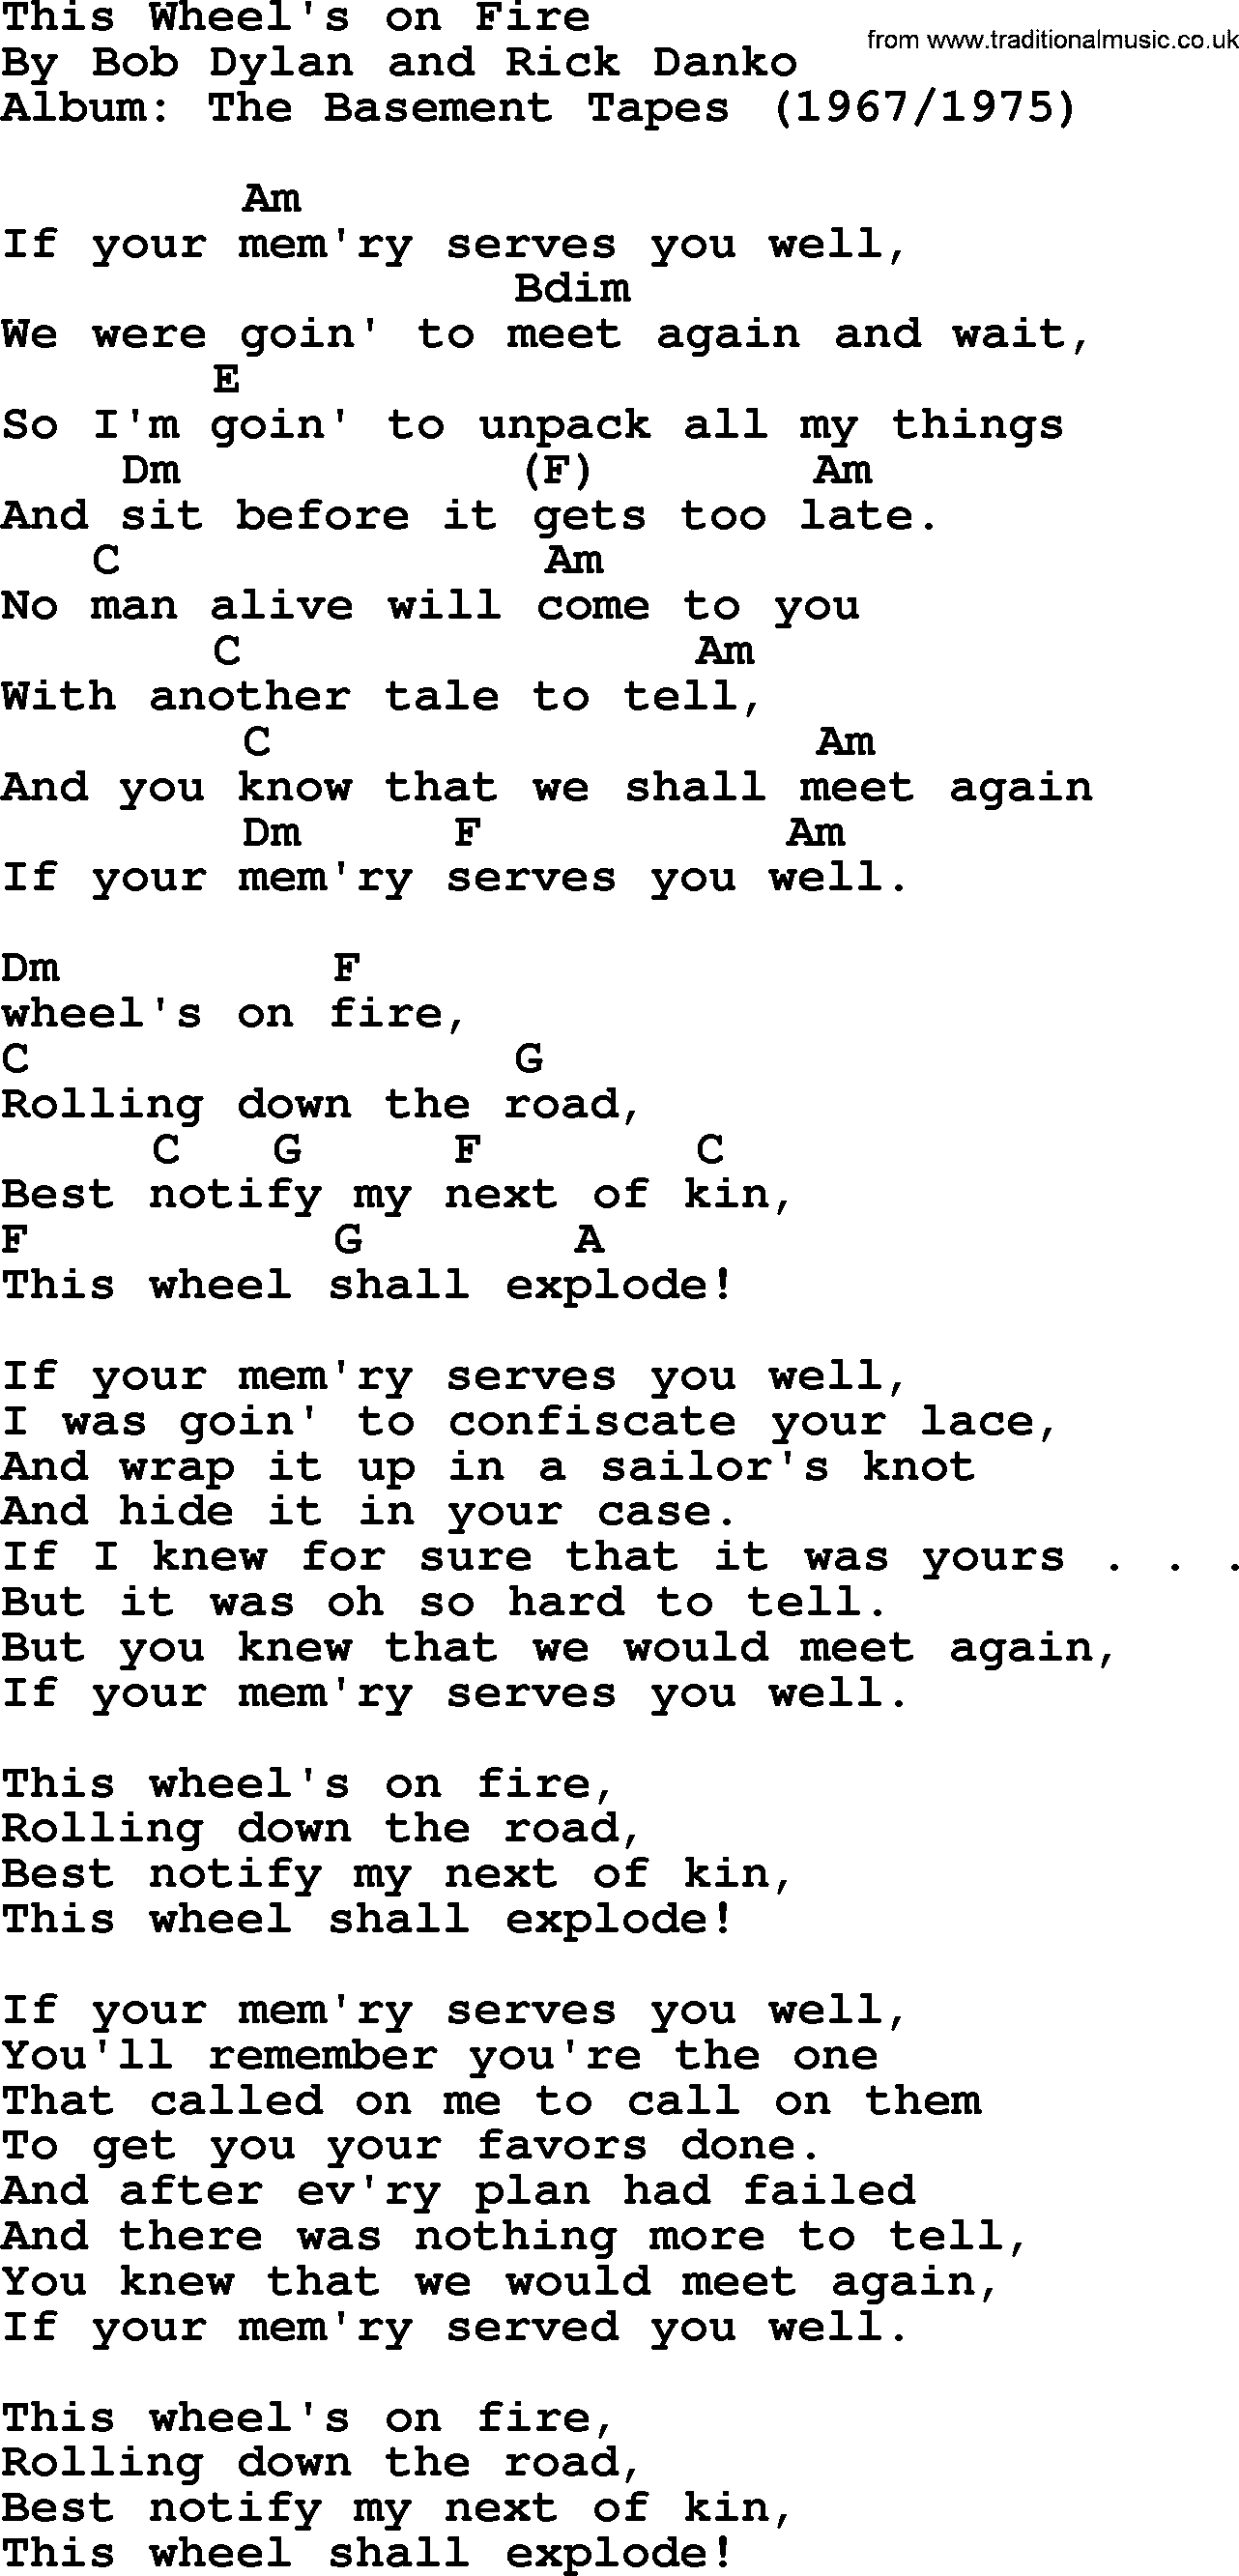 Bob Dylan Song Lyrics With Chords This Wheel S On Fire Bob Dylan Songs Lyrics And Chords Bob Dylan